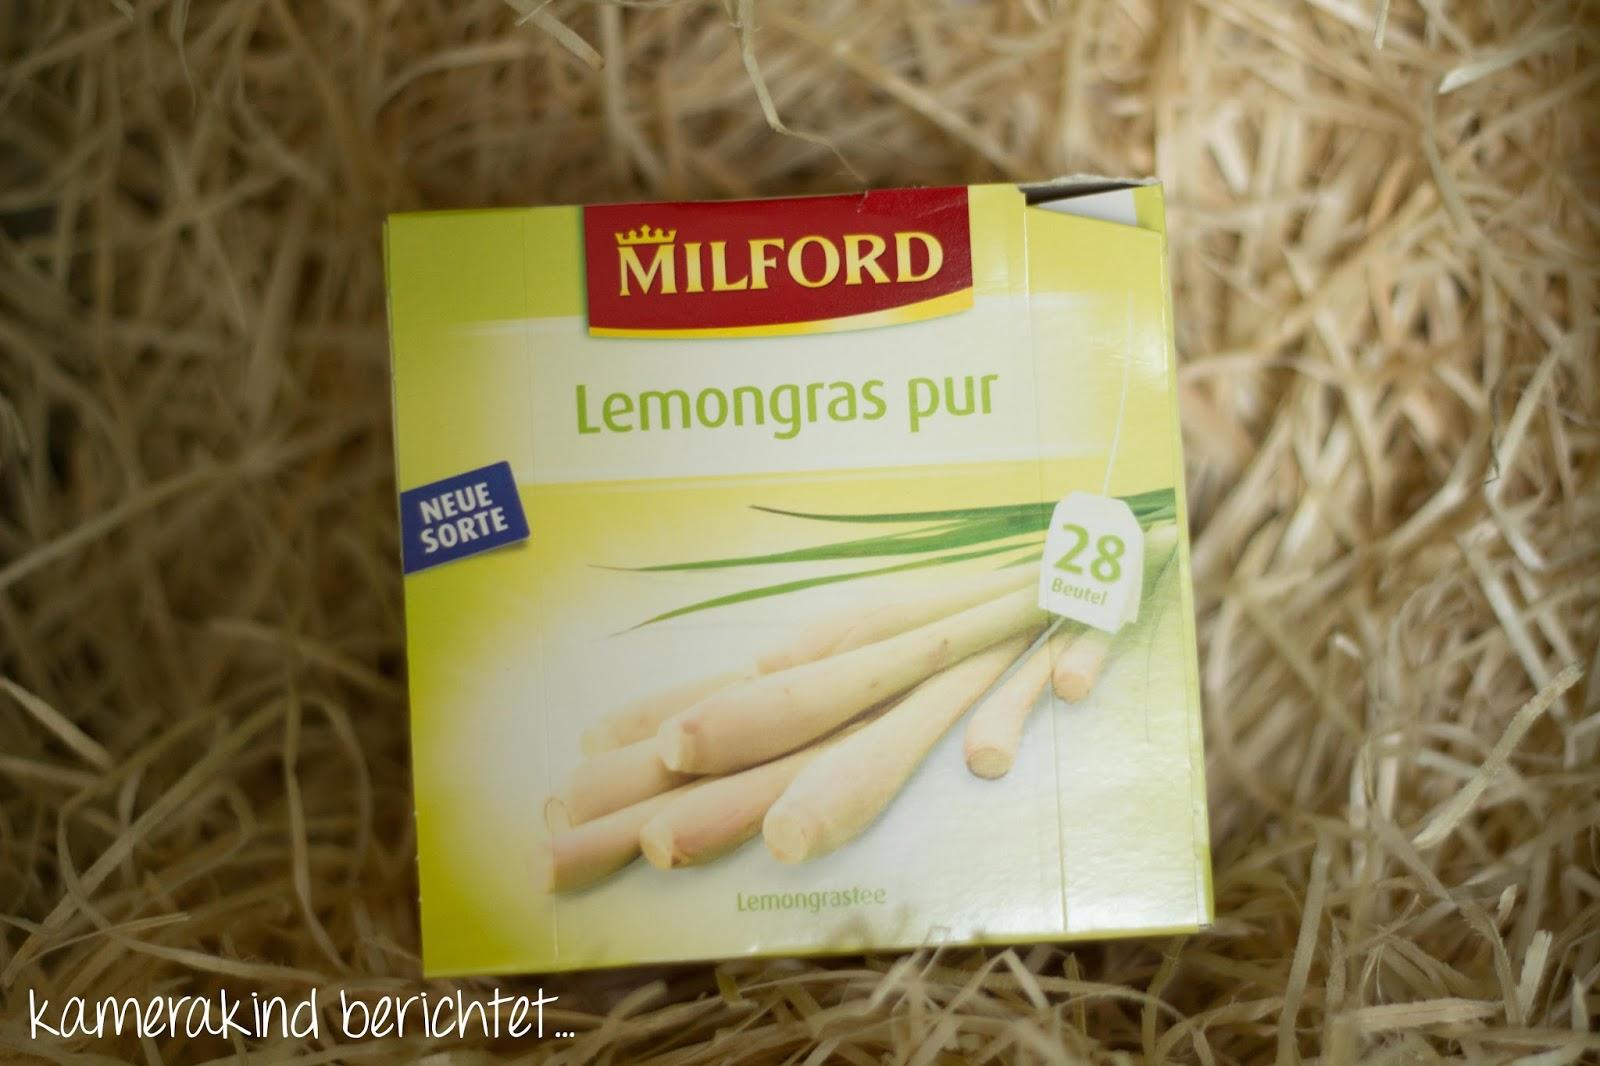 Milford Tee Lemongras pur